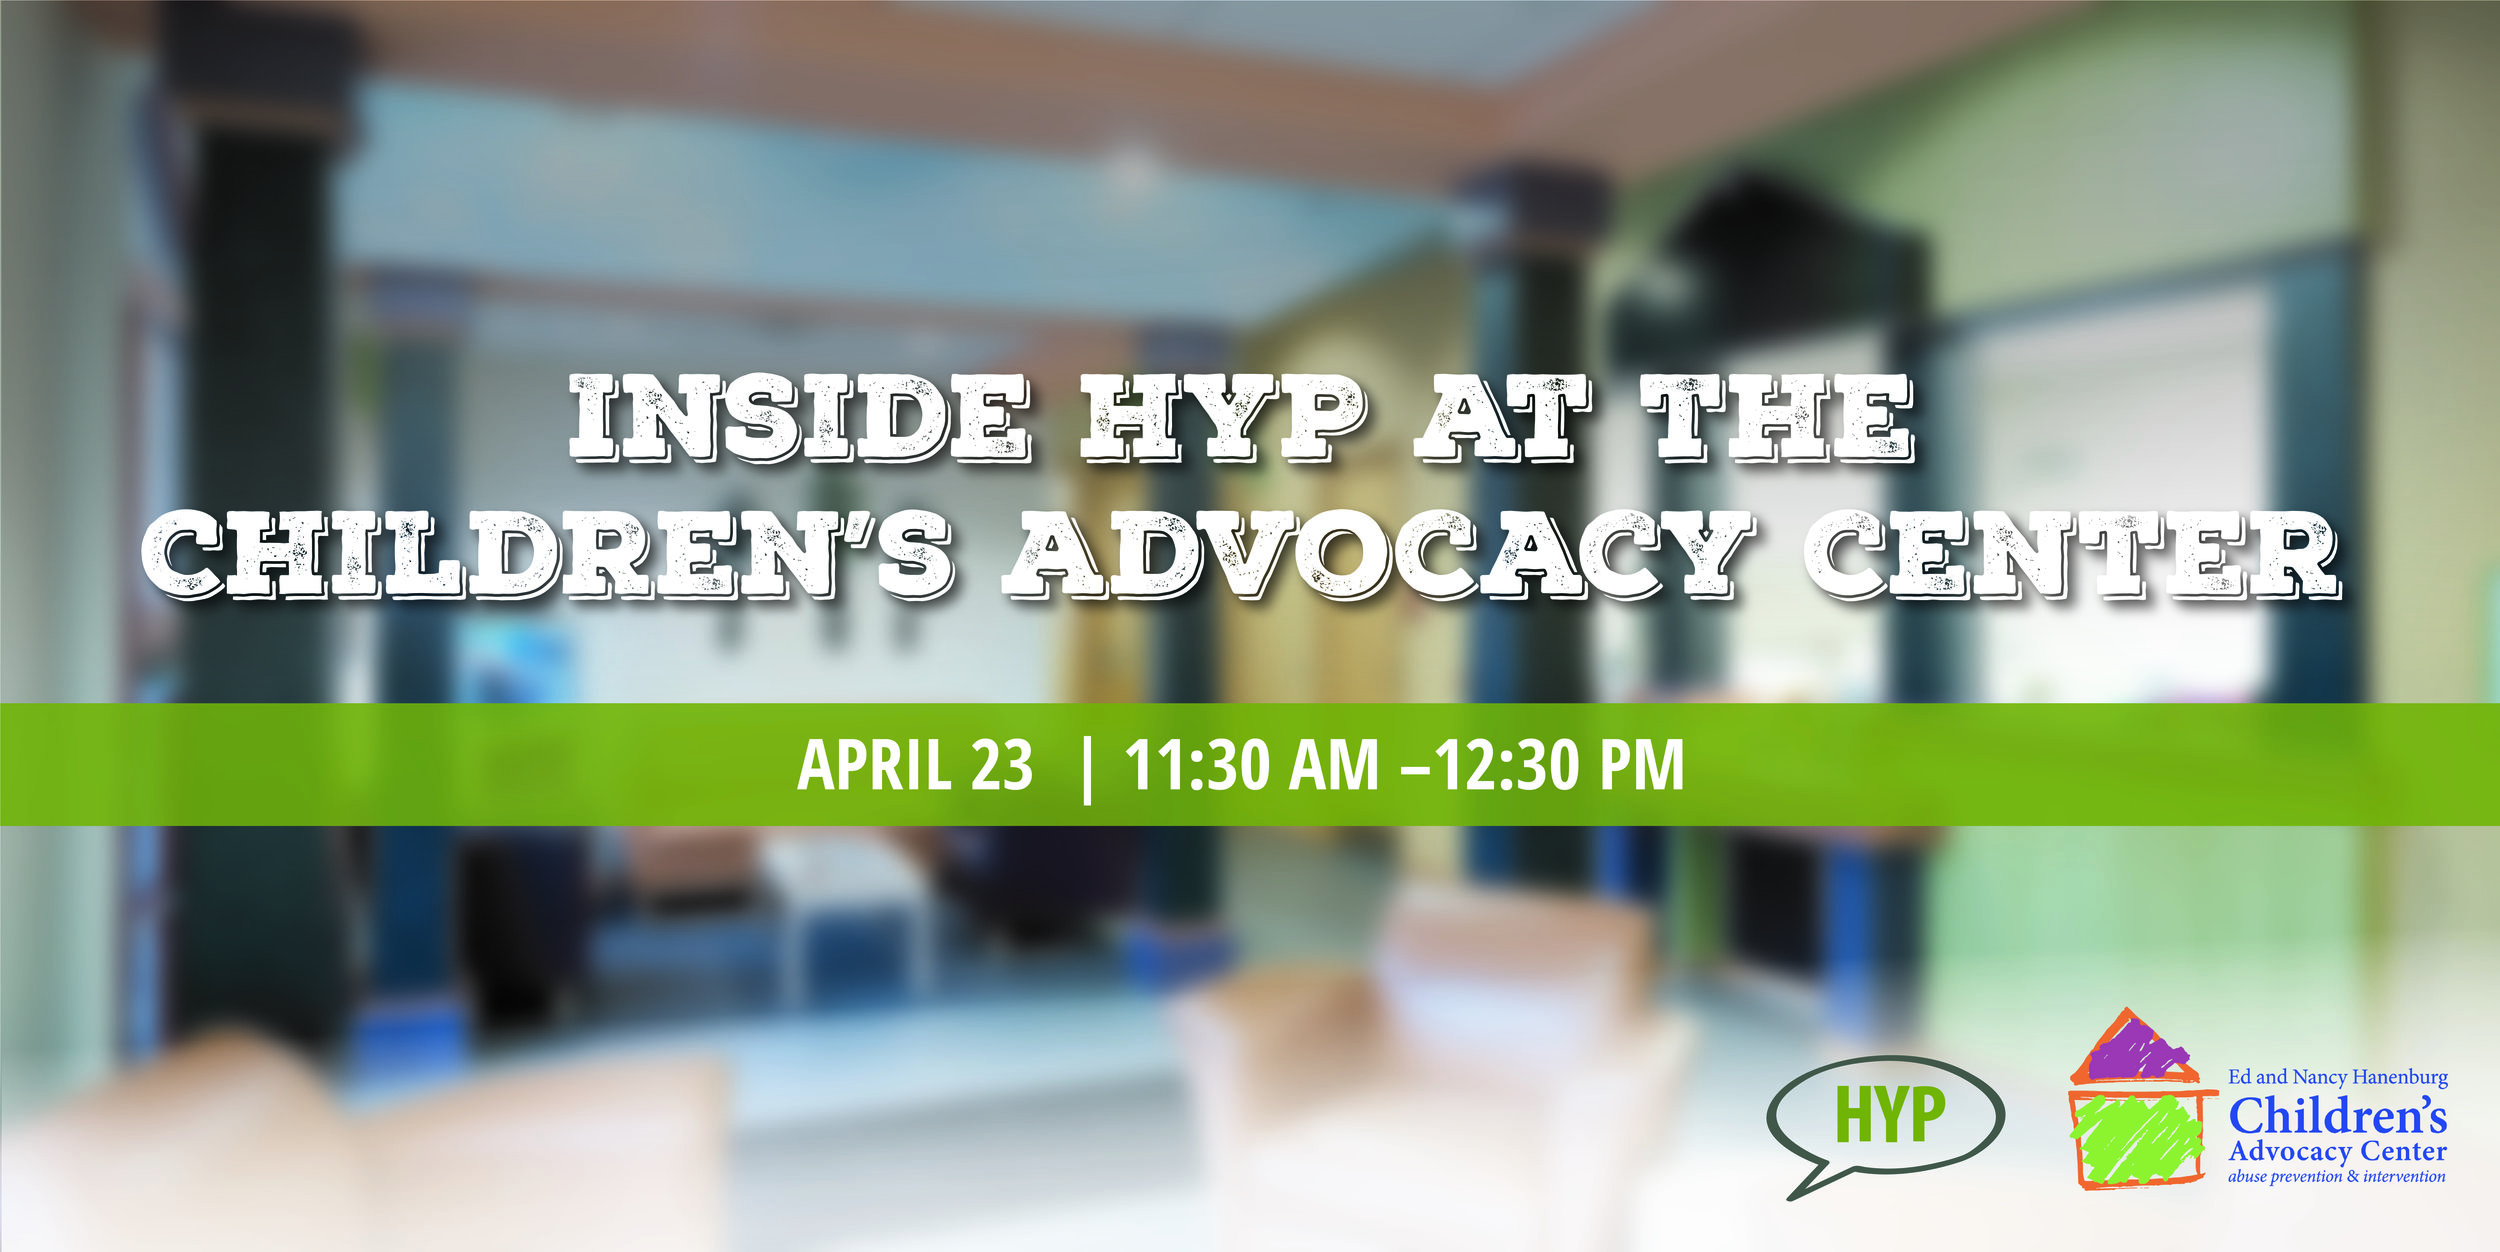 Inside HYP CAC Eventbrite.jpg